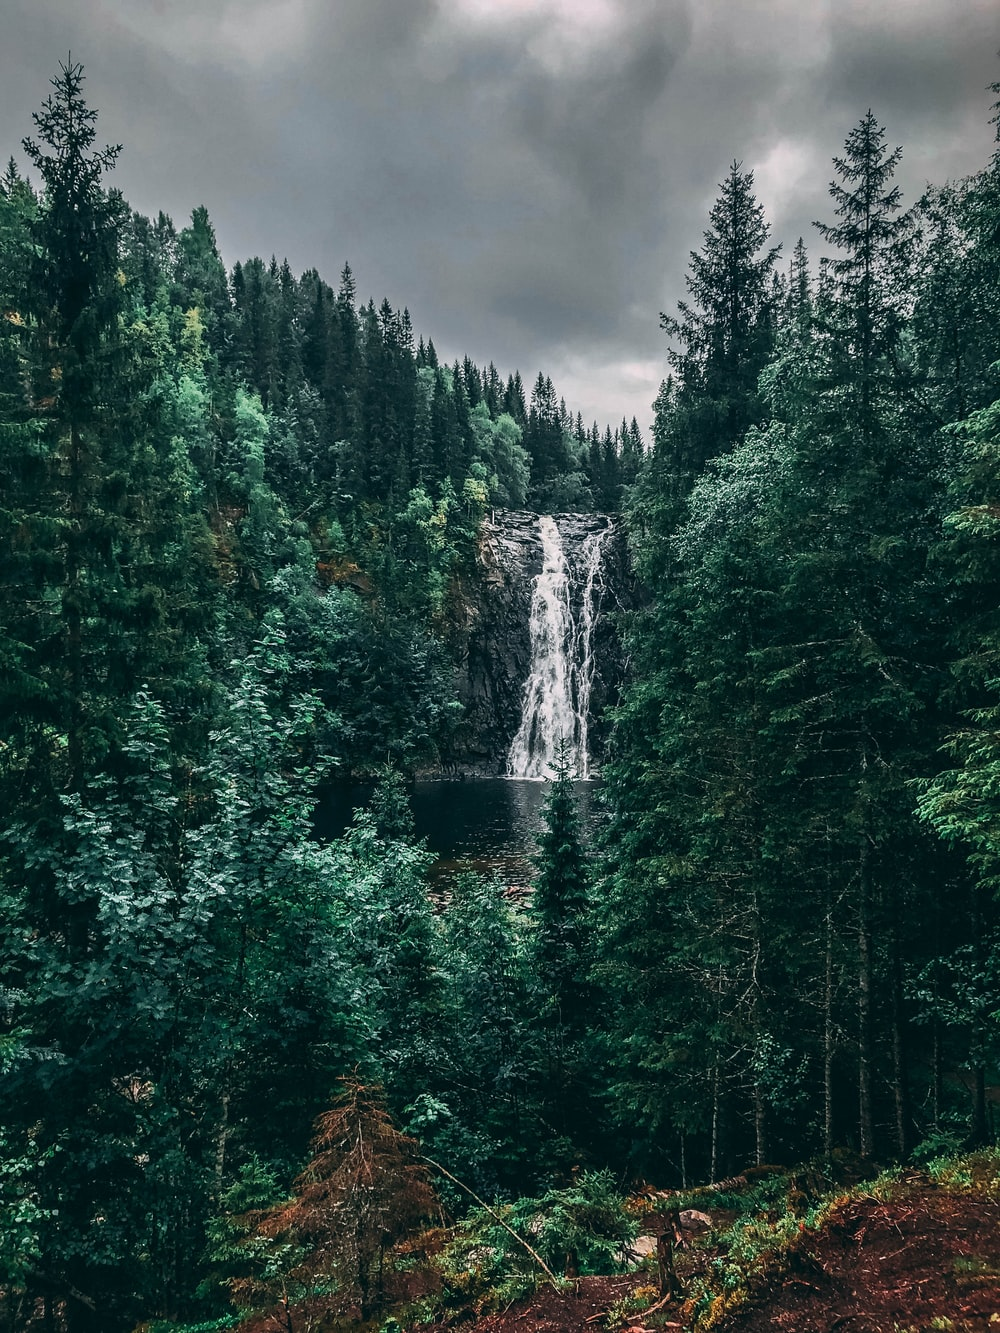 waterfalls between trees